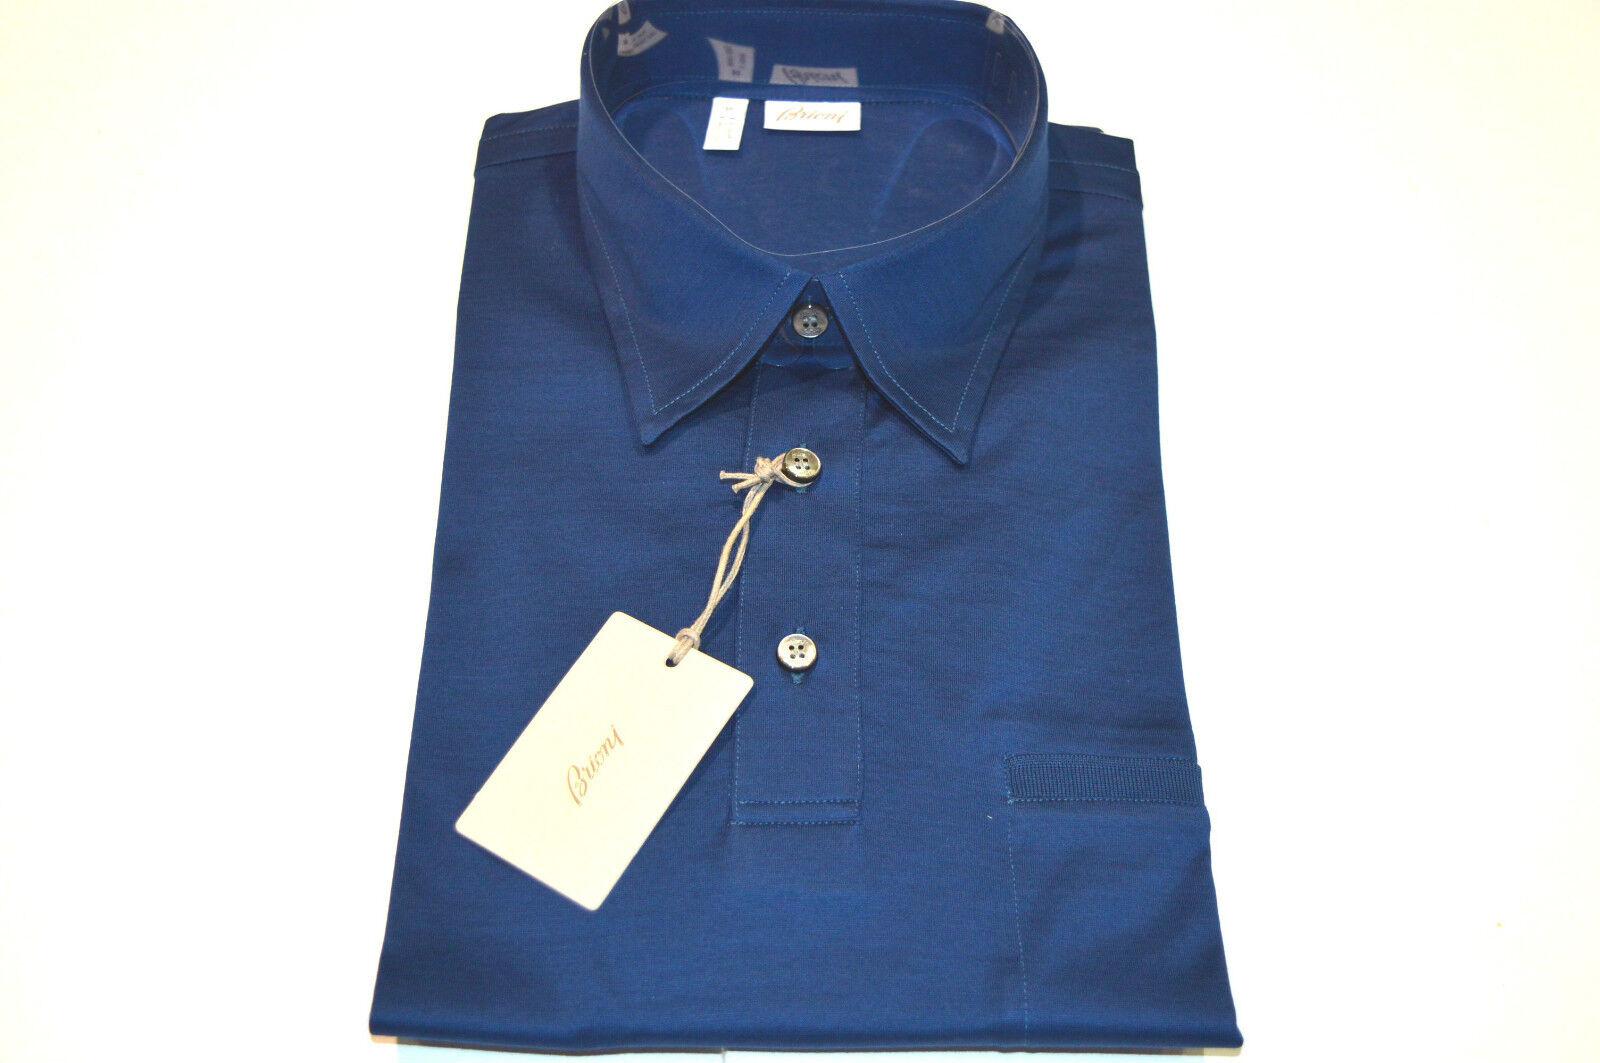 NEW  BRIONI Polo  Short Sleeve baumwolle Größe M Us Eu 50 (SGcoel)